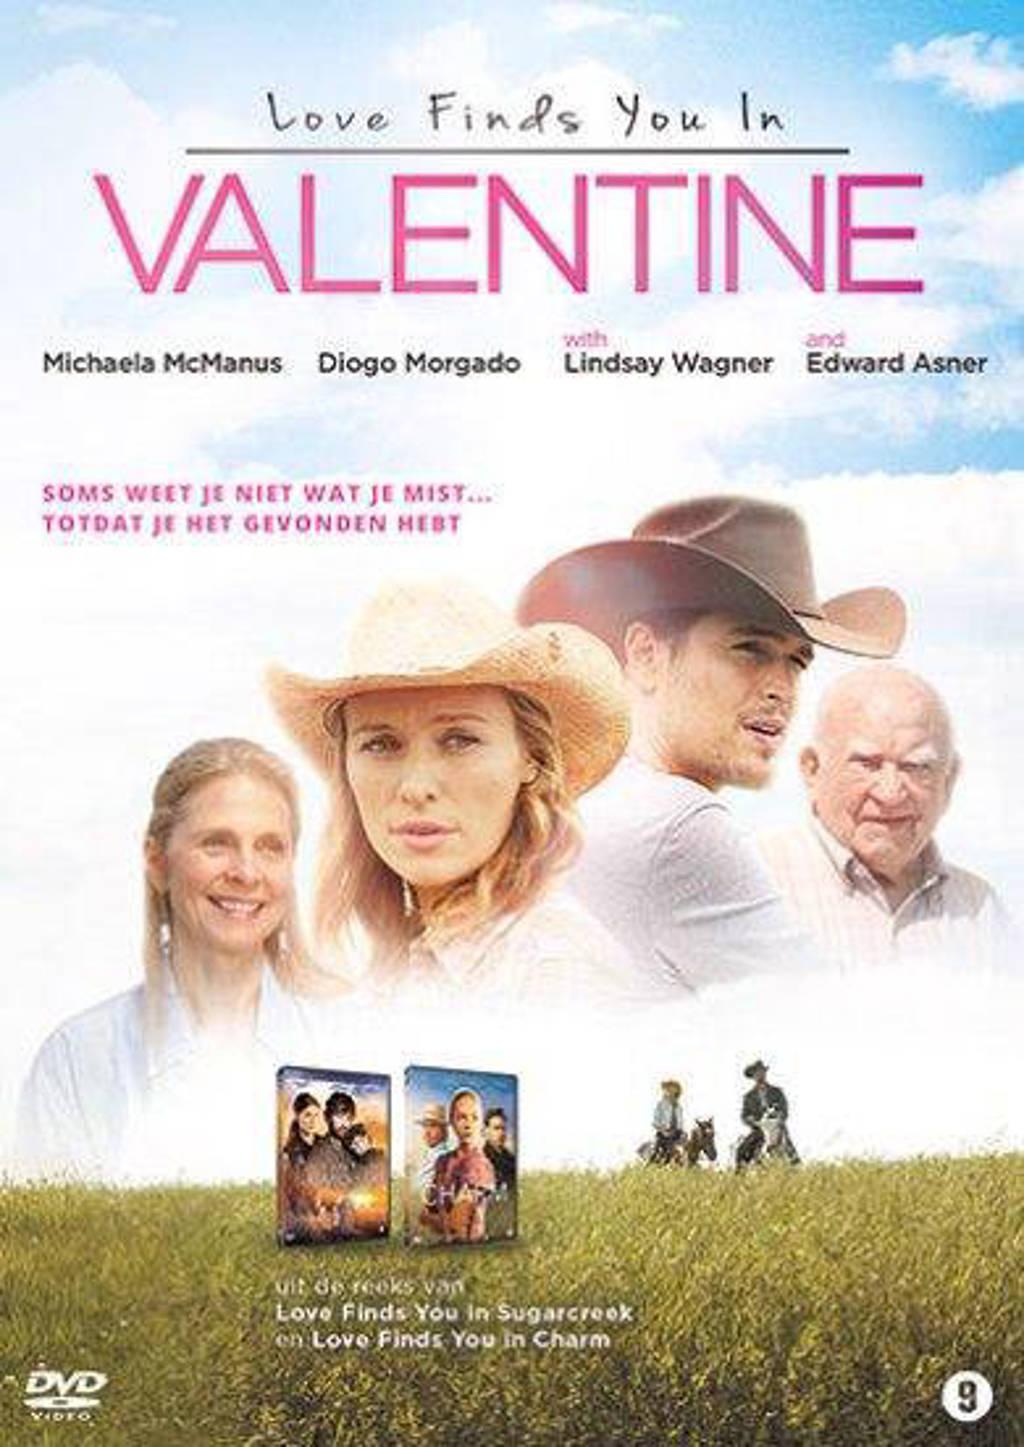 Love finds you in valentine (DVD)